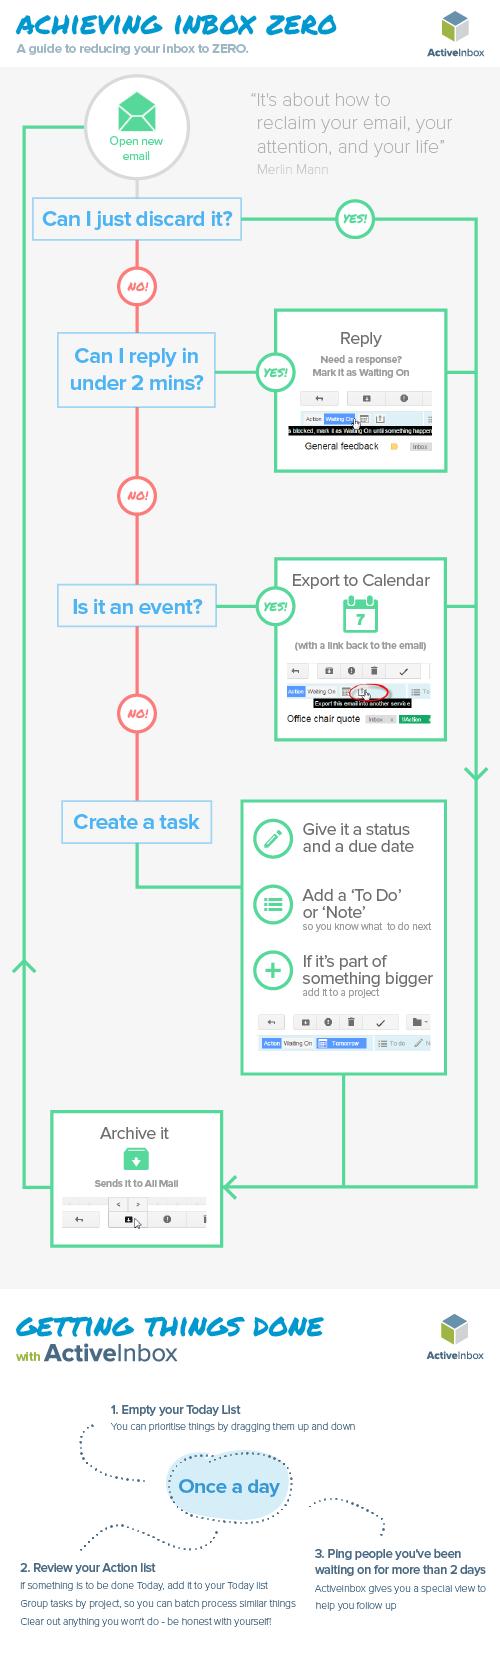 Achieving Inbox Zero in Gmail - ActiveInbox